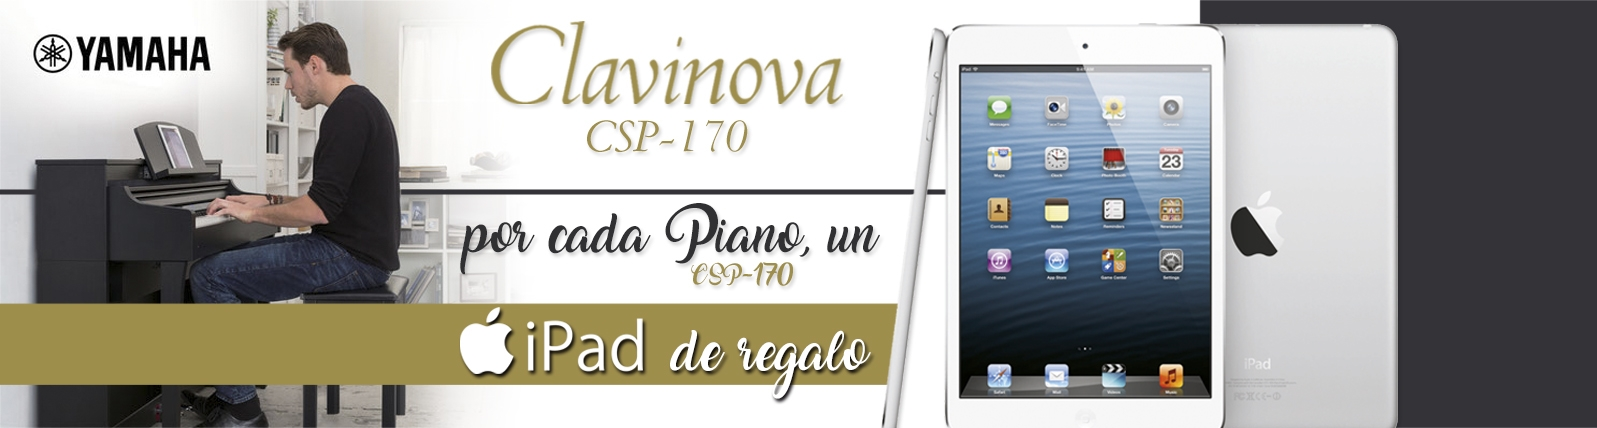 Banner ipad de regalo mas clavinova csp 170